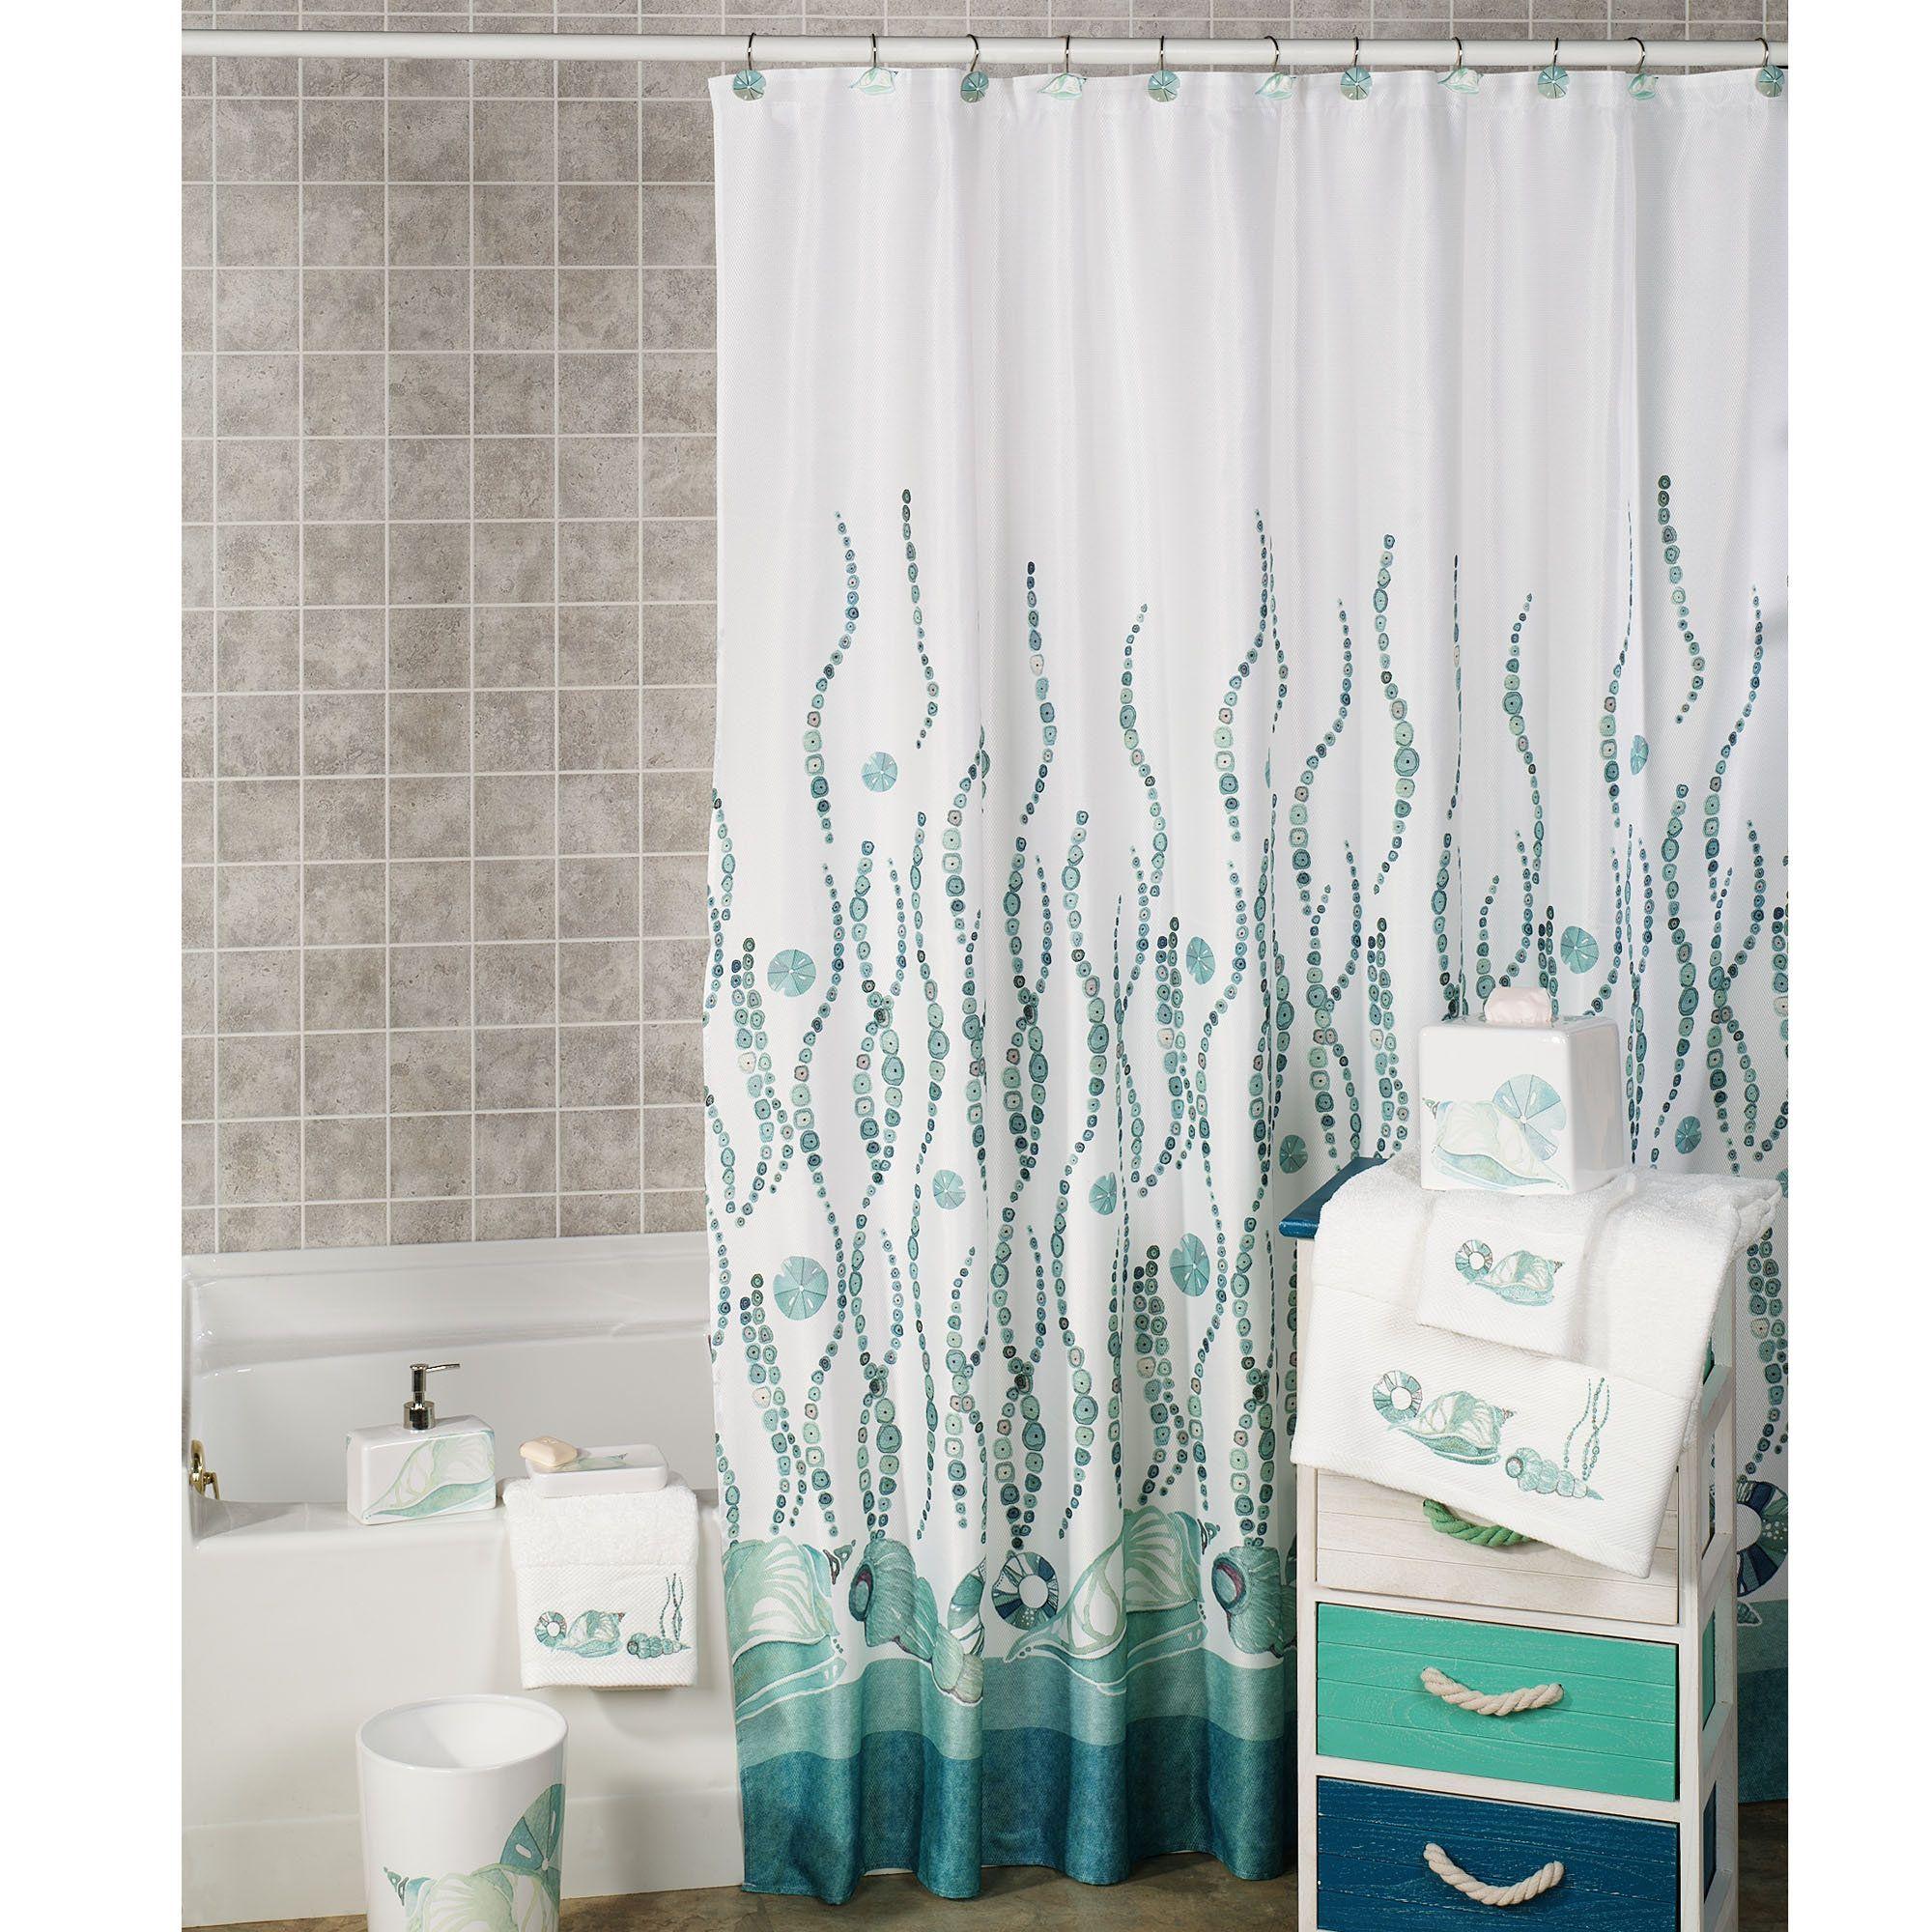 La Mer Coastal Shower Curtain